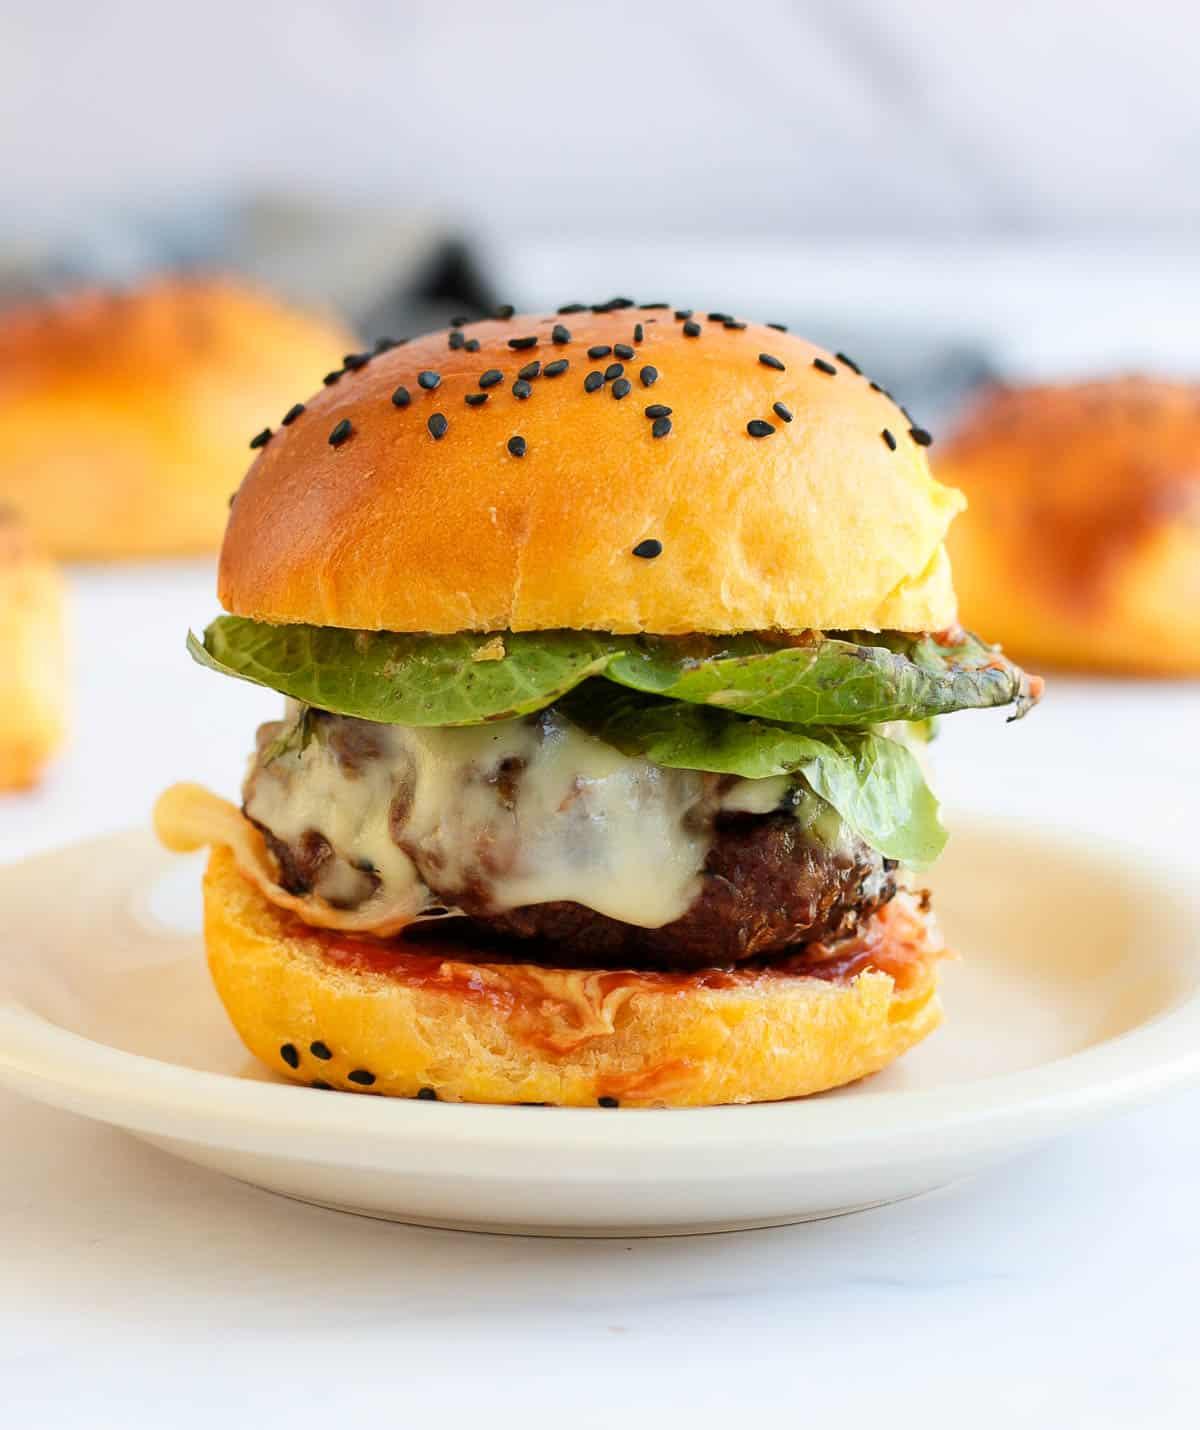 Plated Hamburger made with a sweet potato bun.